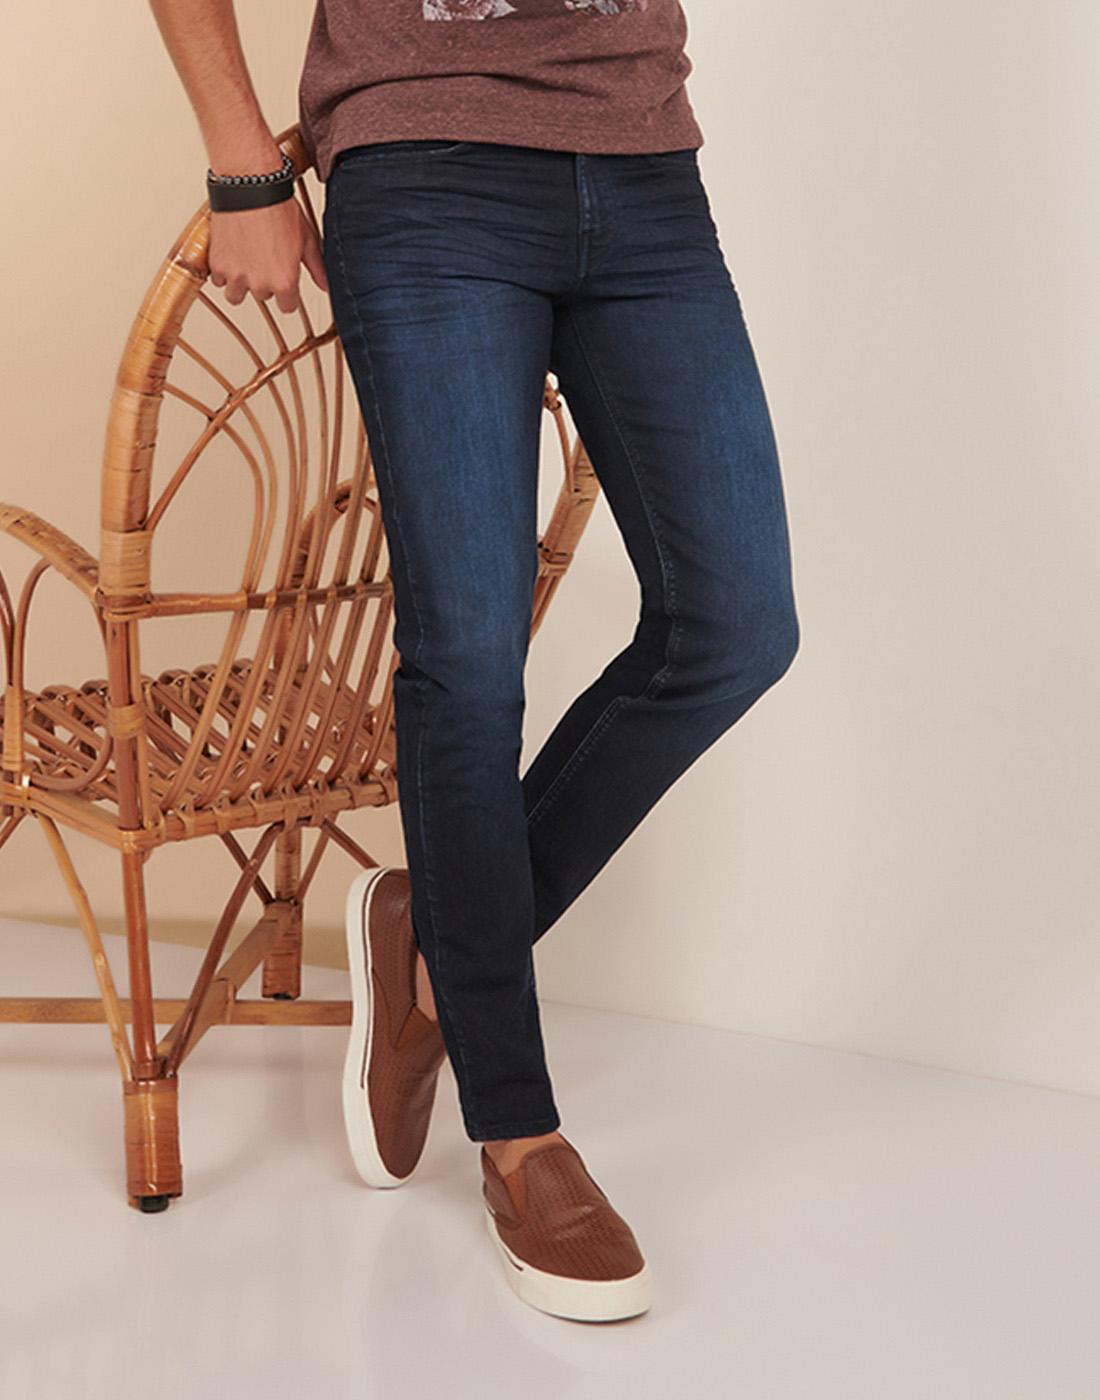 Calça Masc. Just Fit Jeans Amaciado Six One